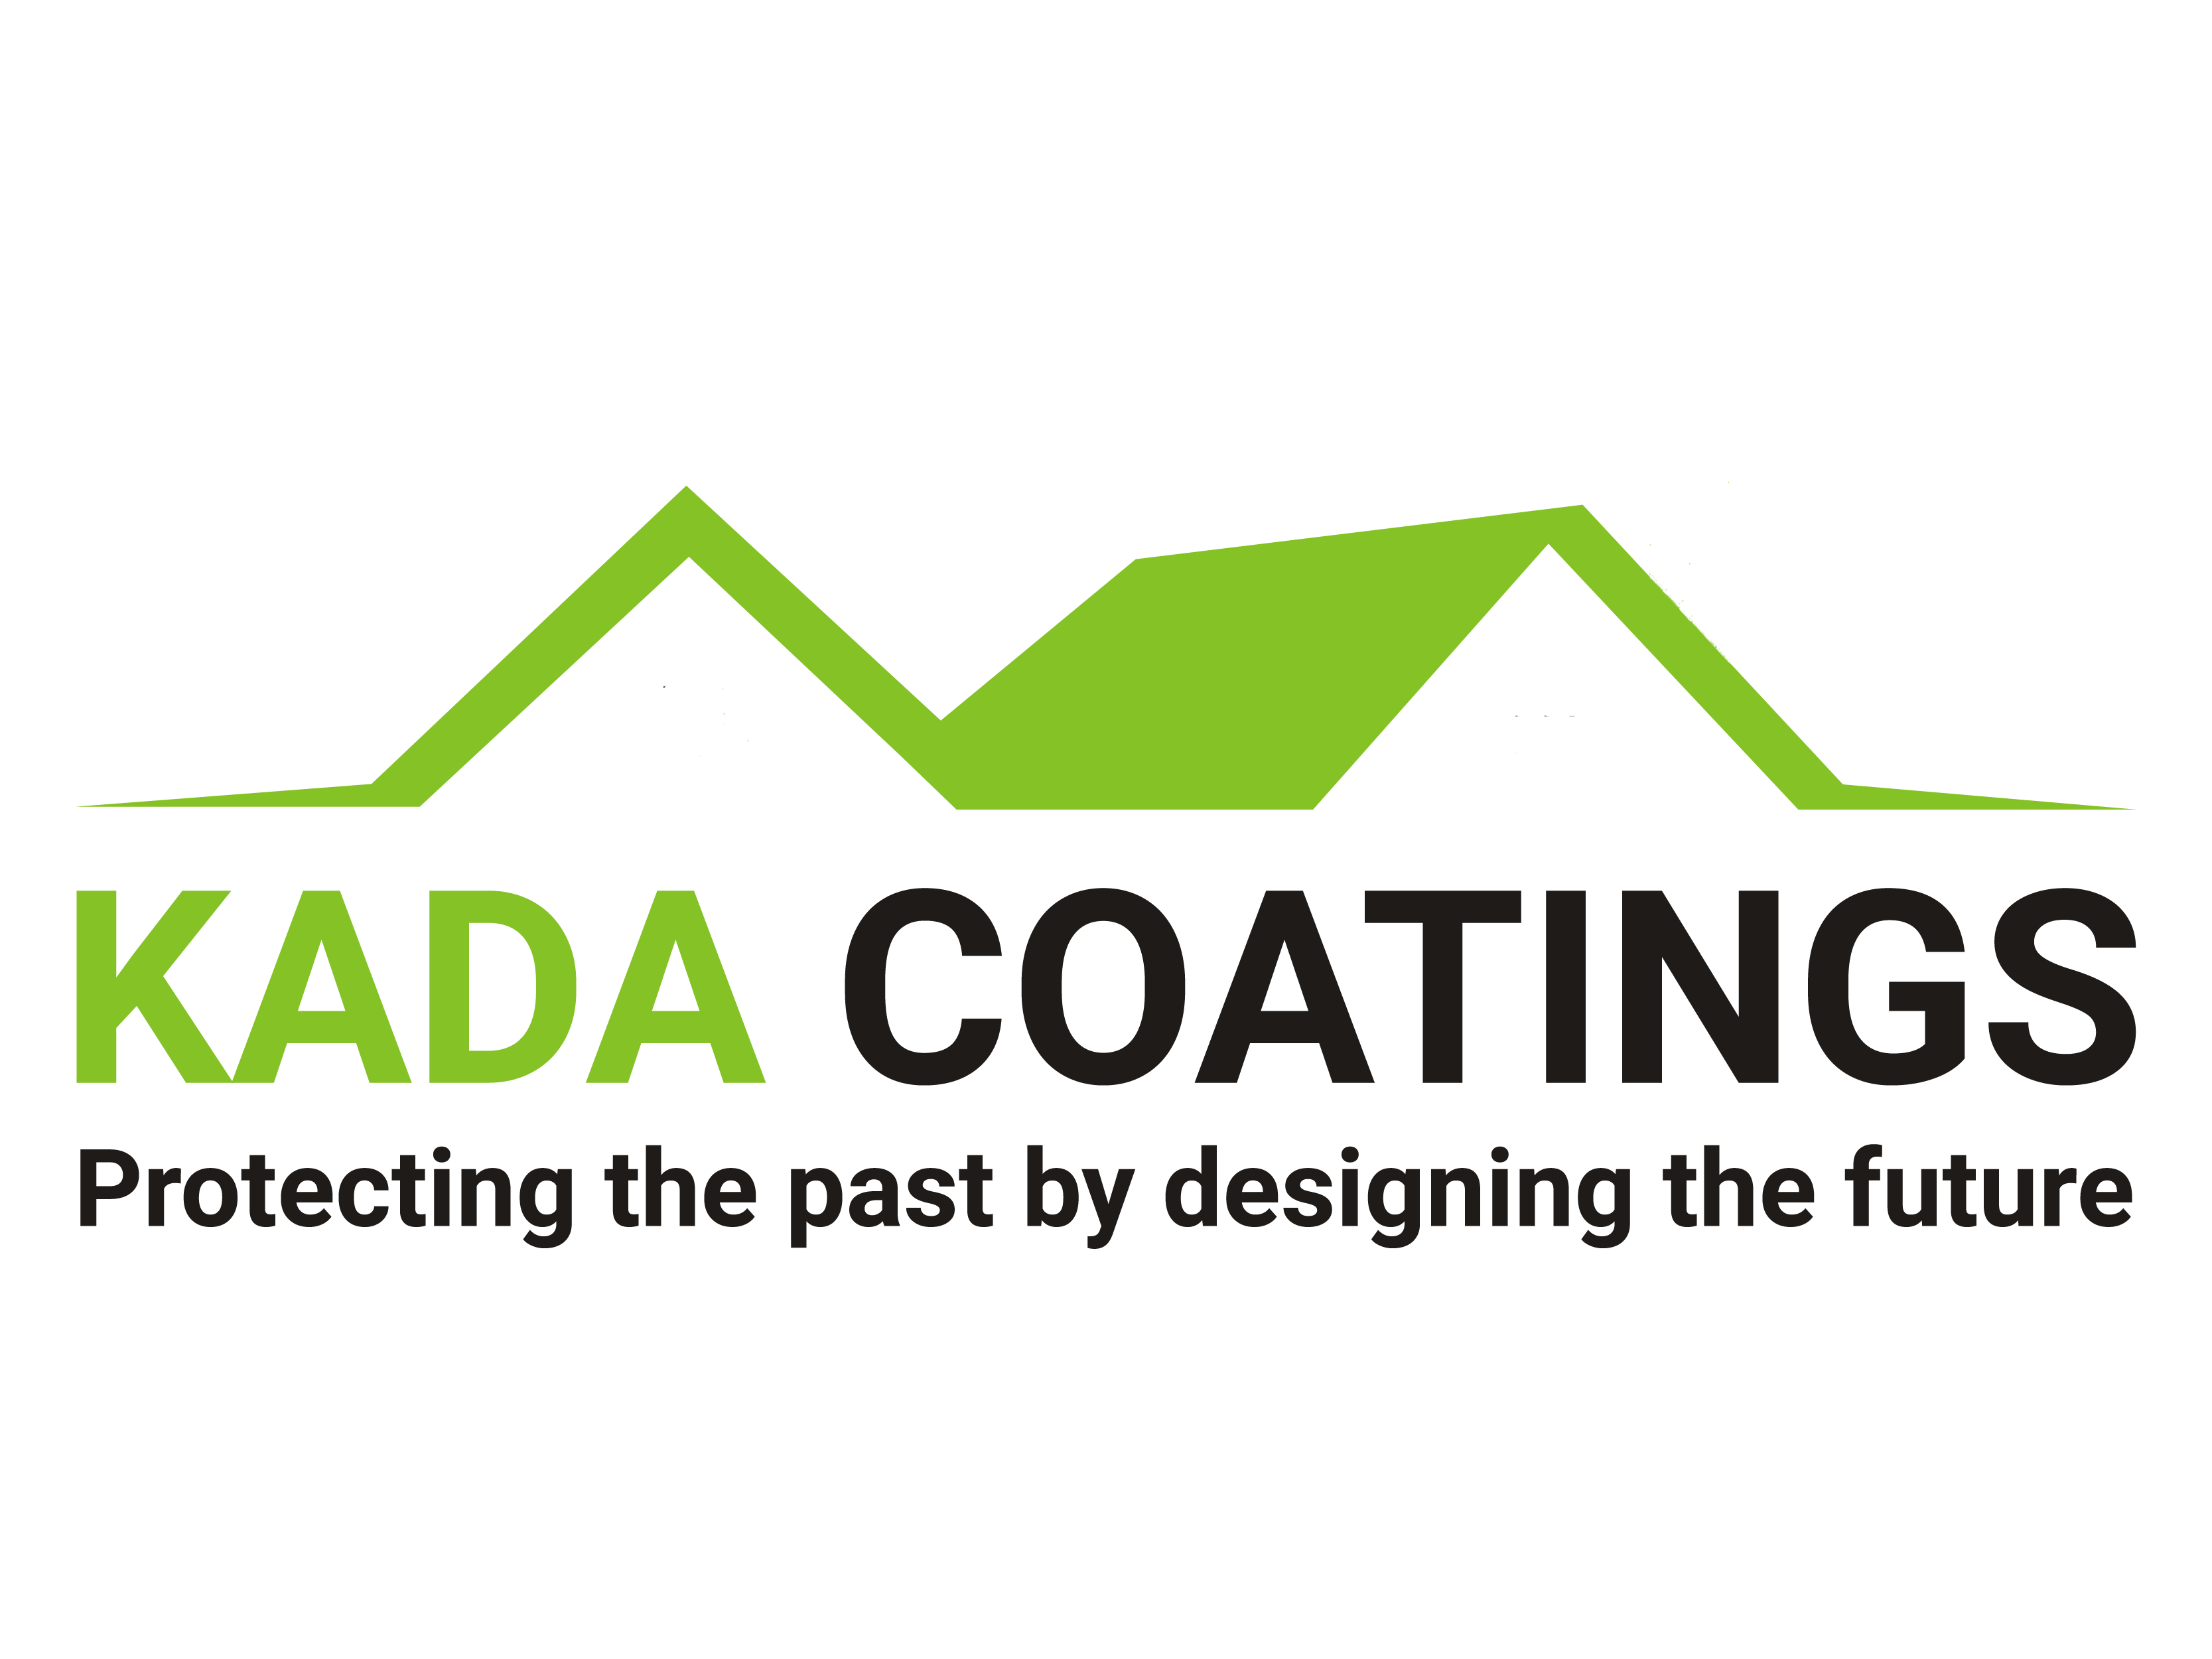 Home Kada Coatings